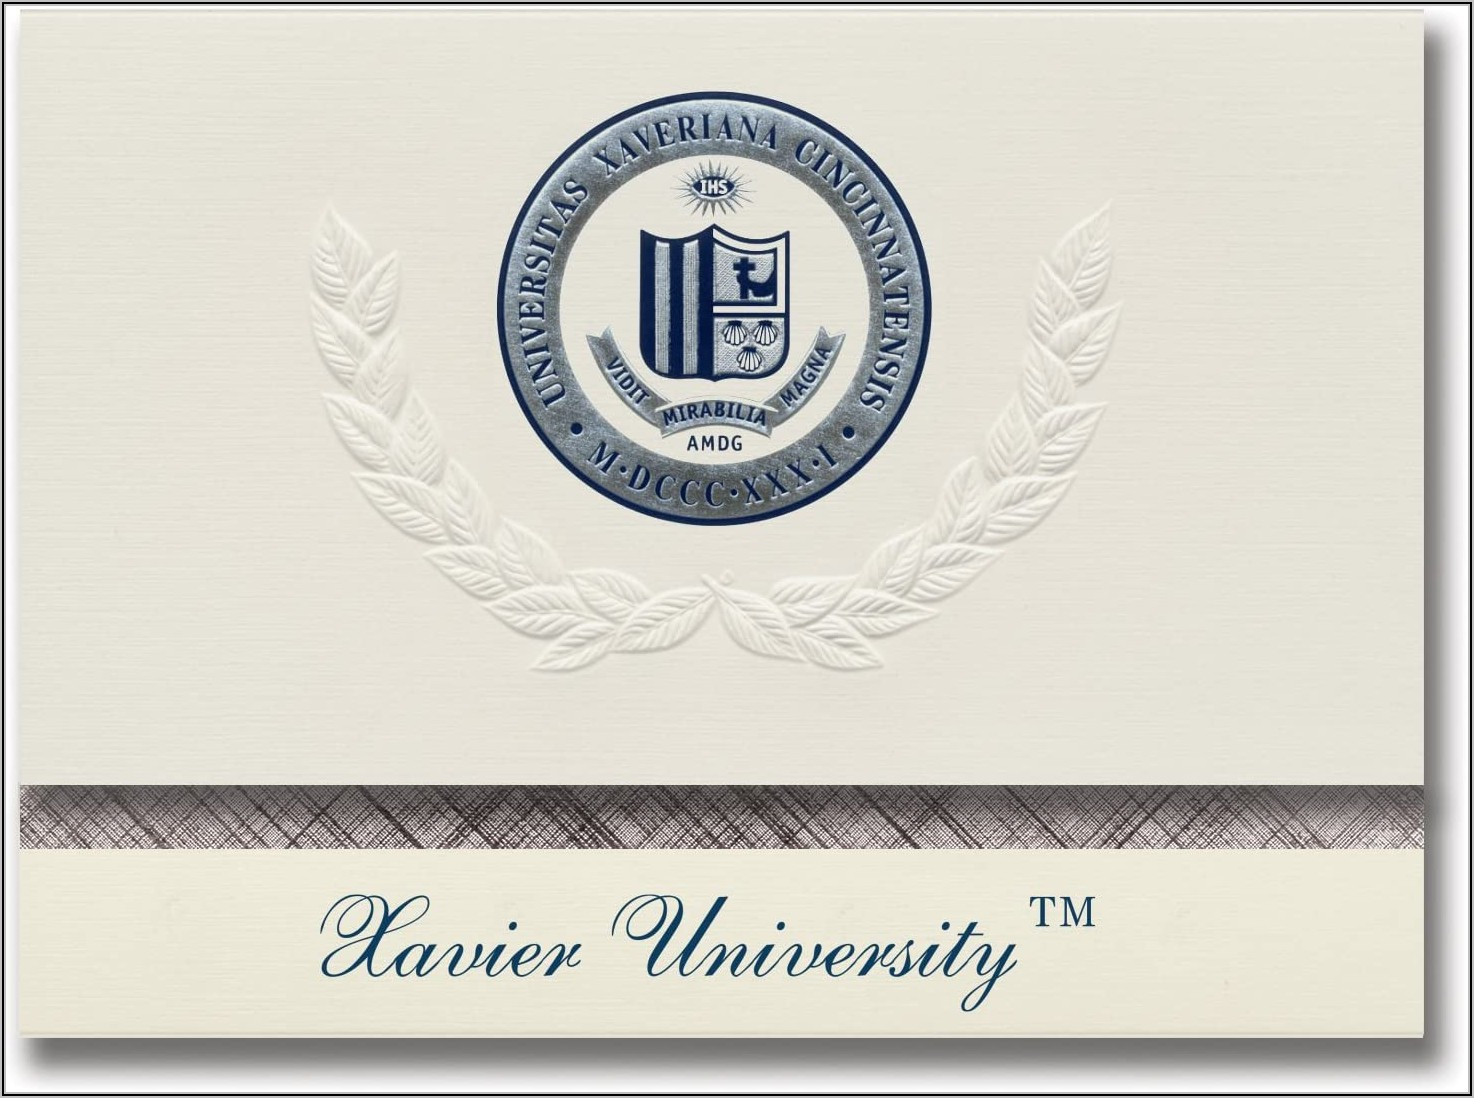 Xavier University Graduation Announcements